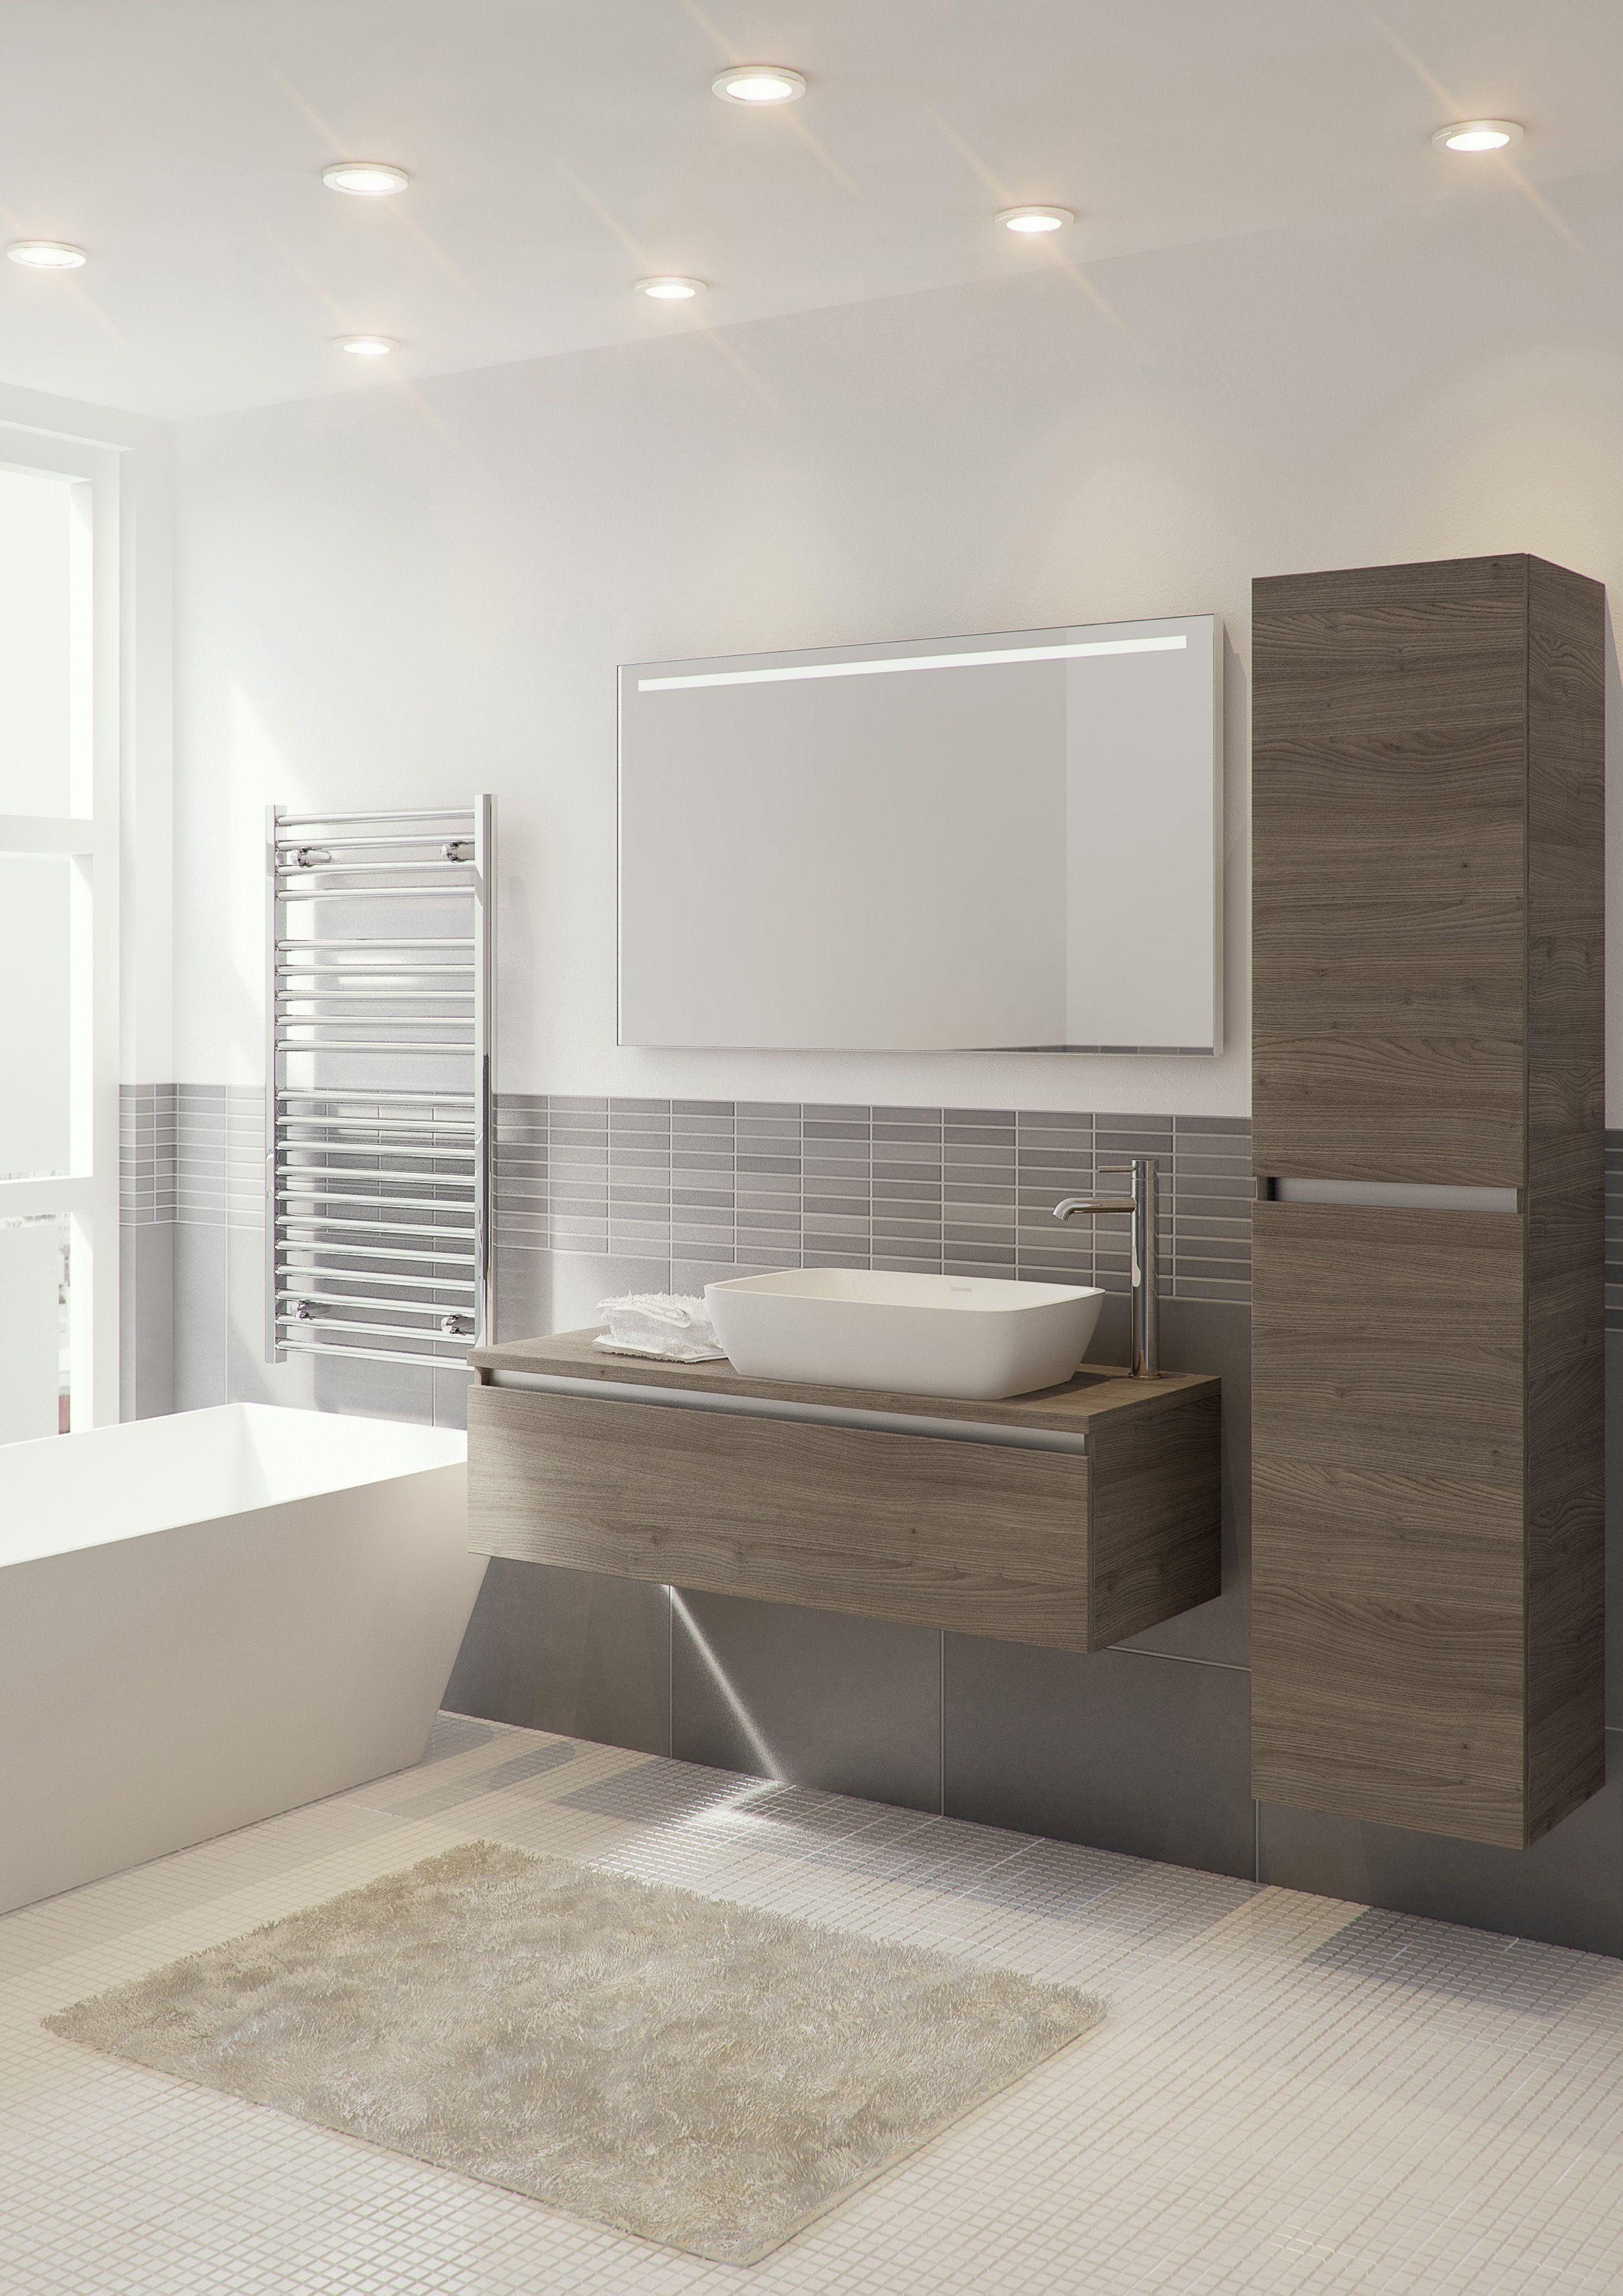 Bruynzeel badmeubel en hoge kast Faro in de kleur tortona badkamerkast badkamer idee meuble salle de bain